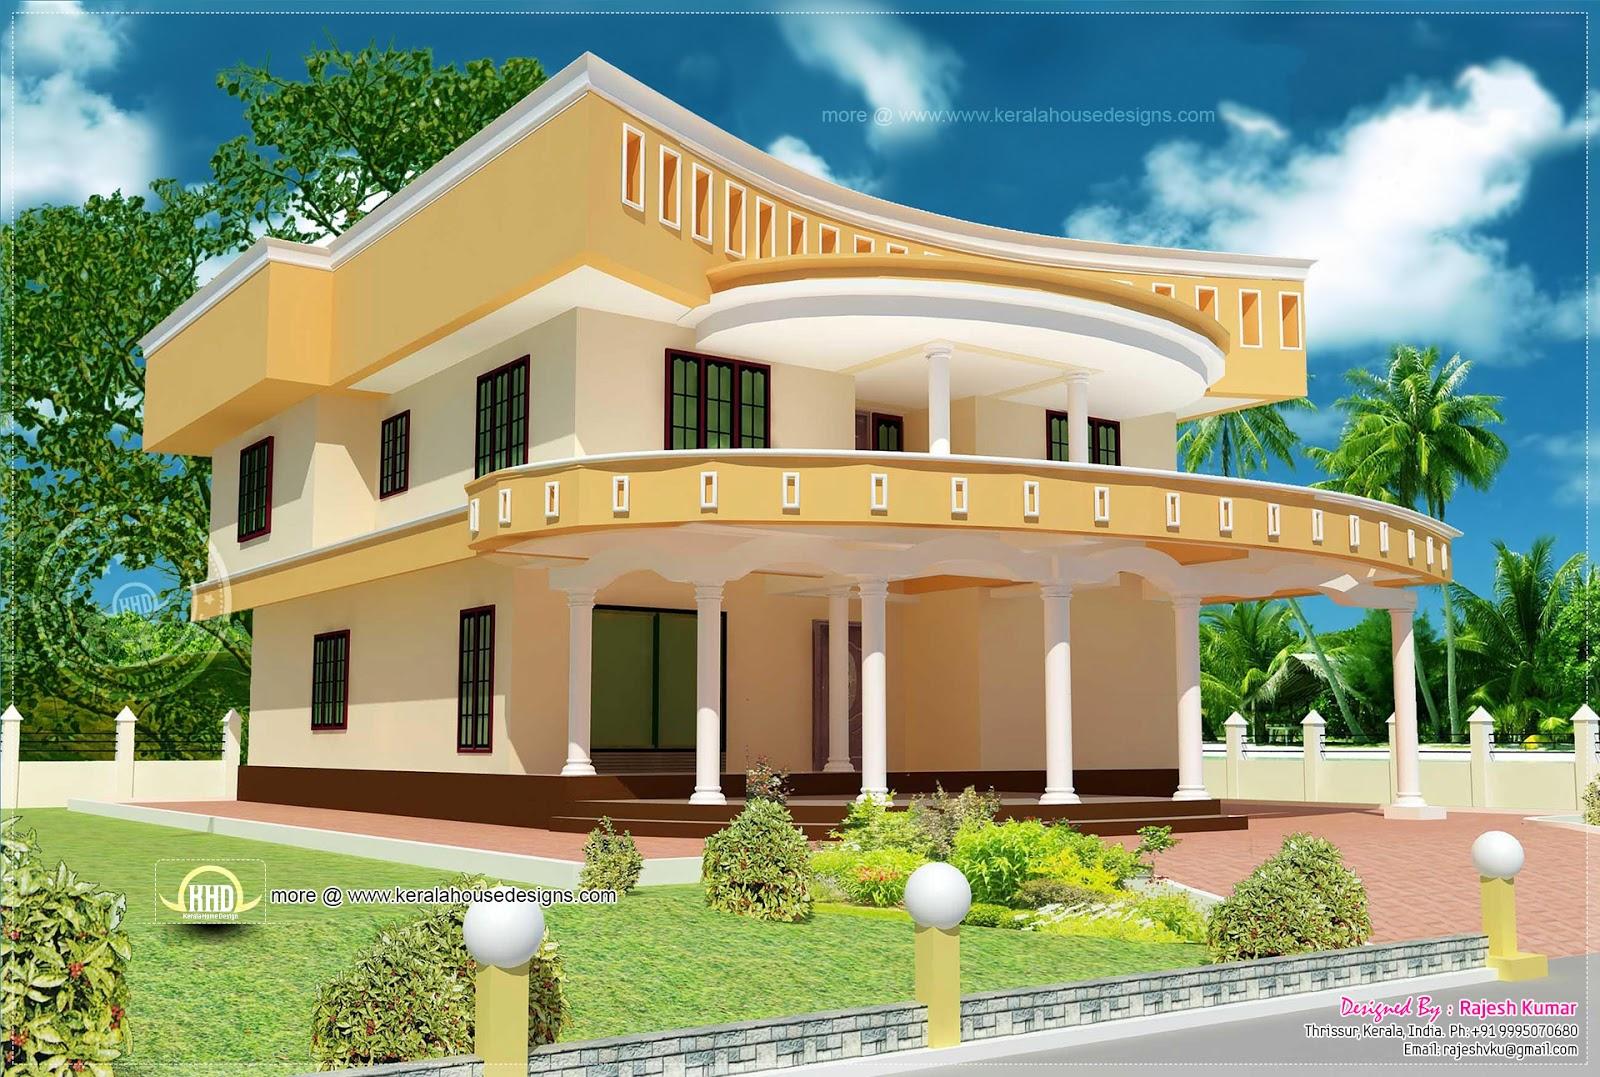 unique home design in kerala kerala home design and floor plans. Black Bedroom Furniture Sets. Home Design Ideas